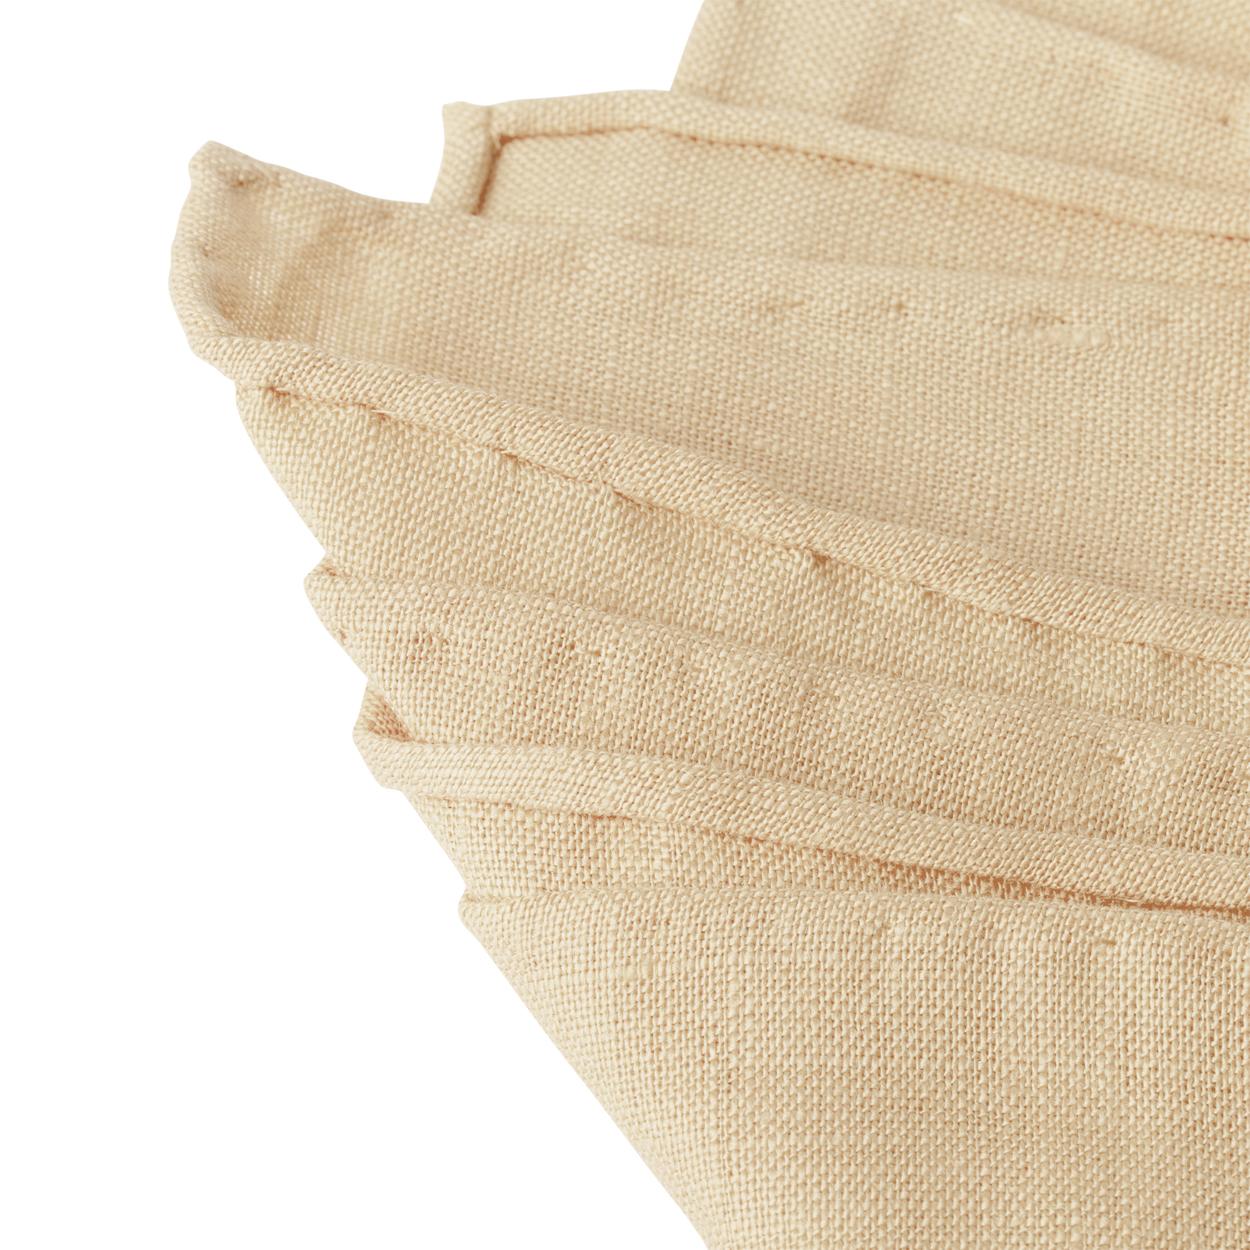 Jacob-Alexander-Linen-Handrolled-15-034-x-15-034-Pocket-Square-Hanky thumbnail 37